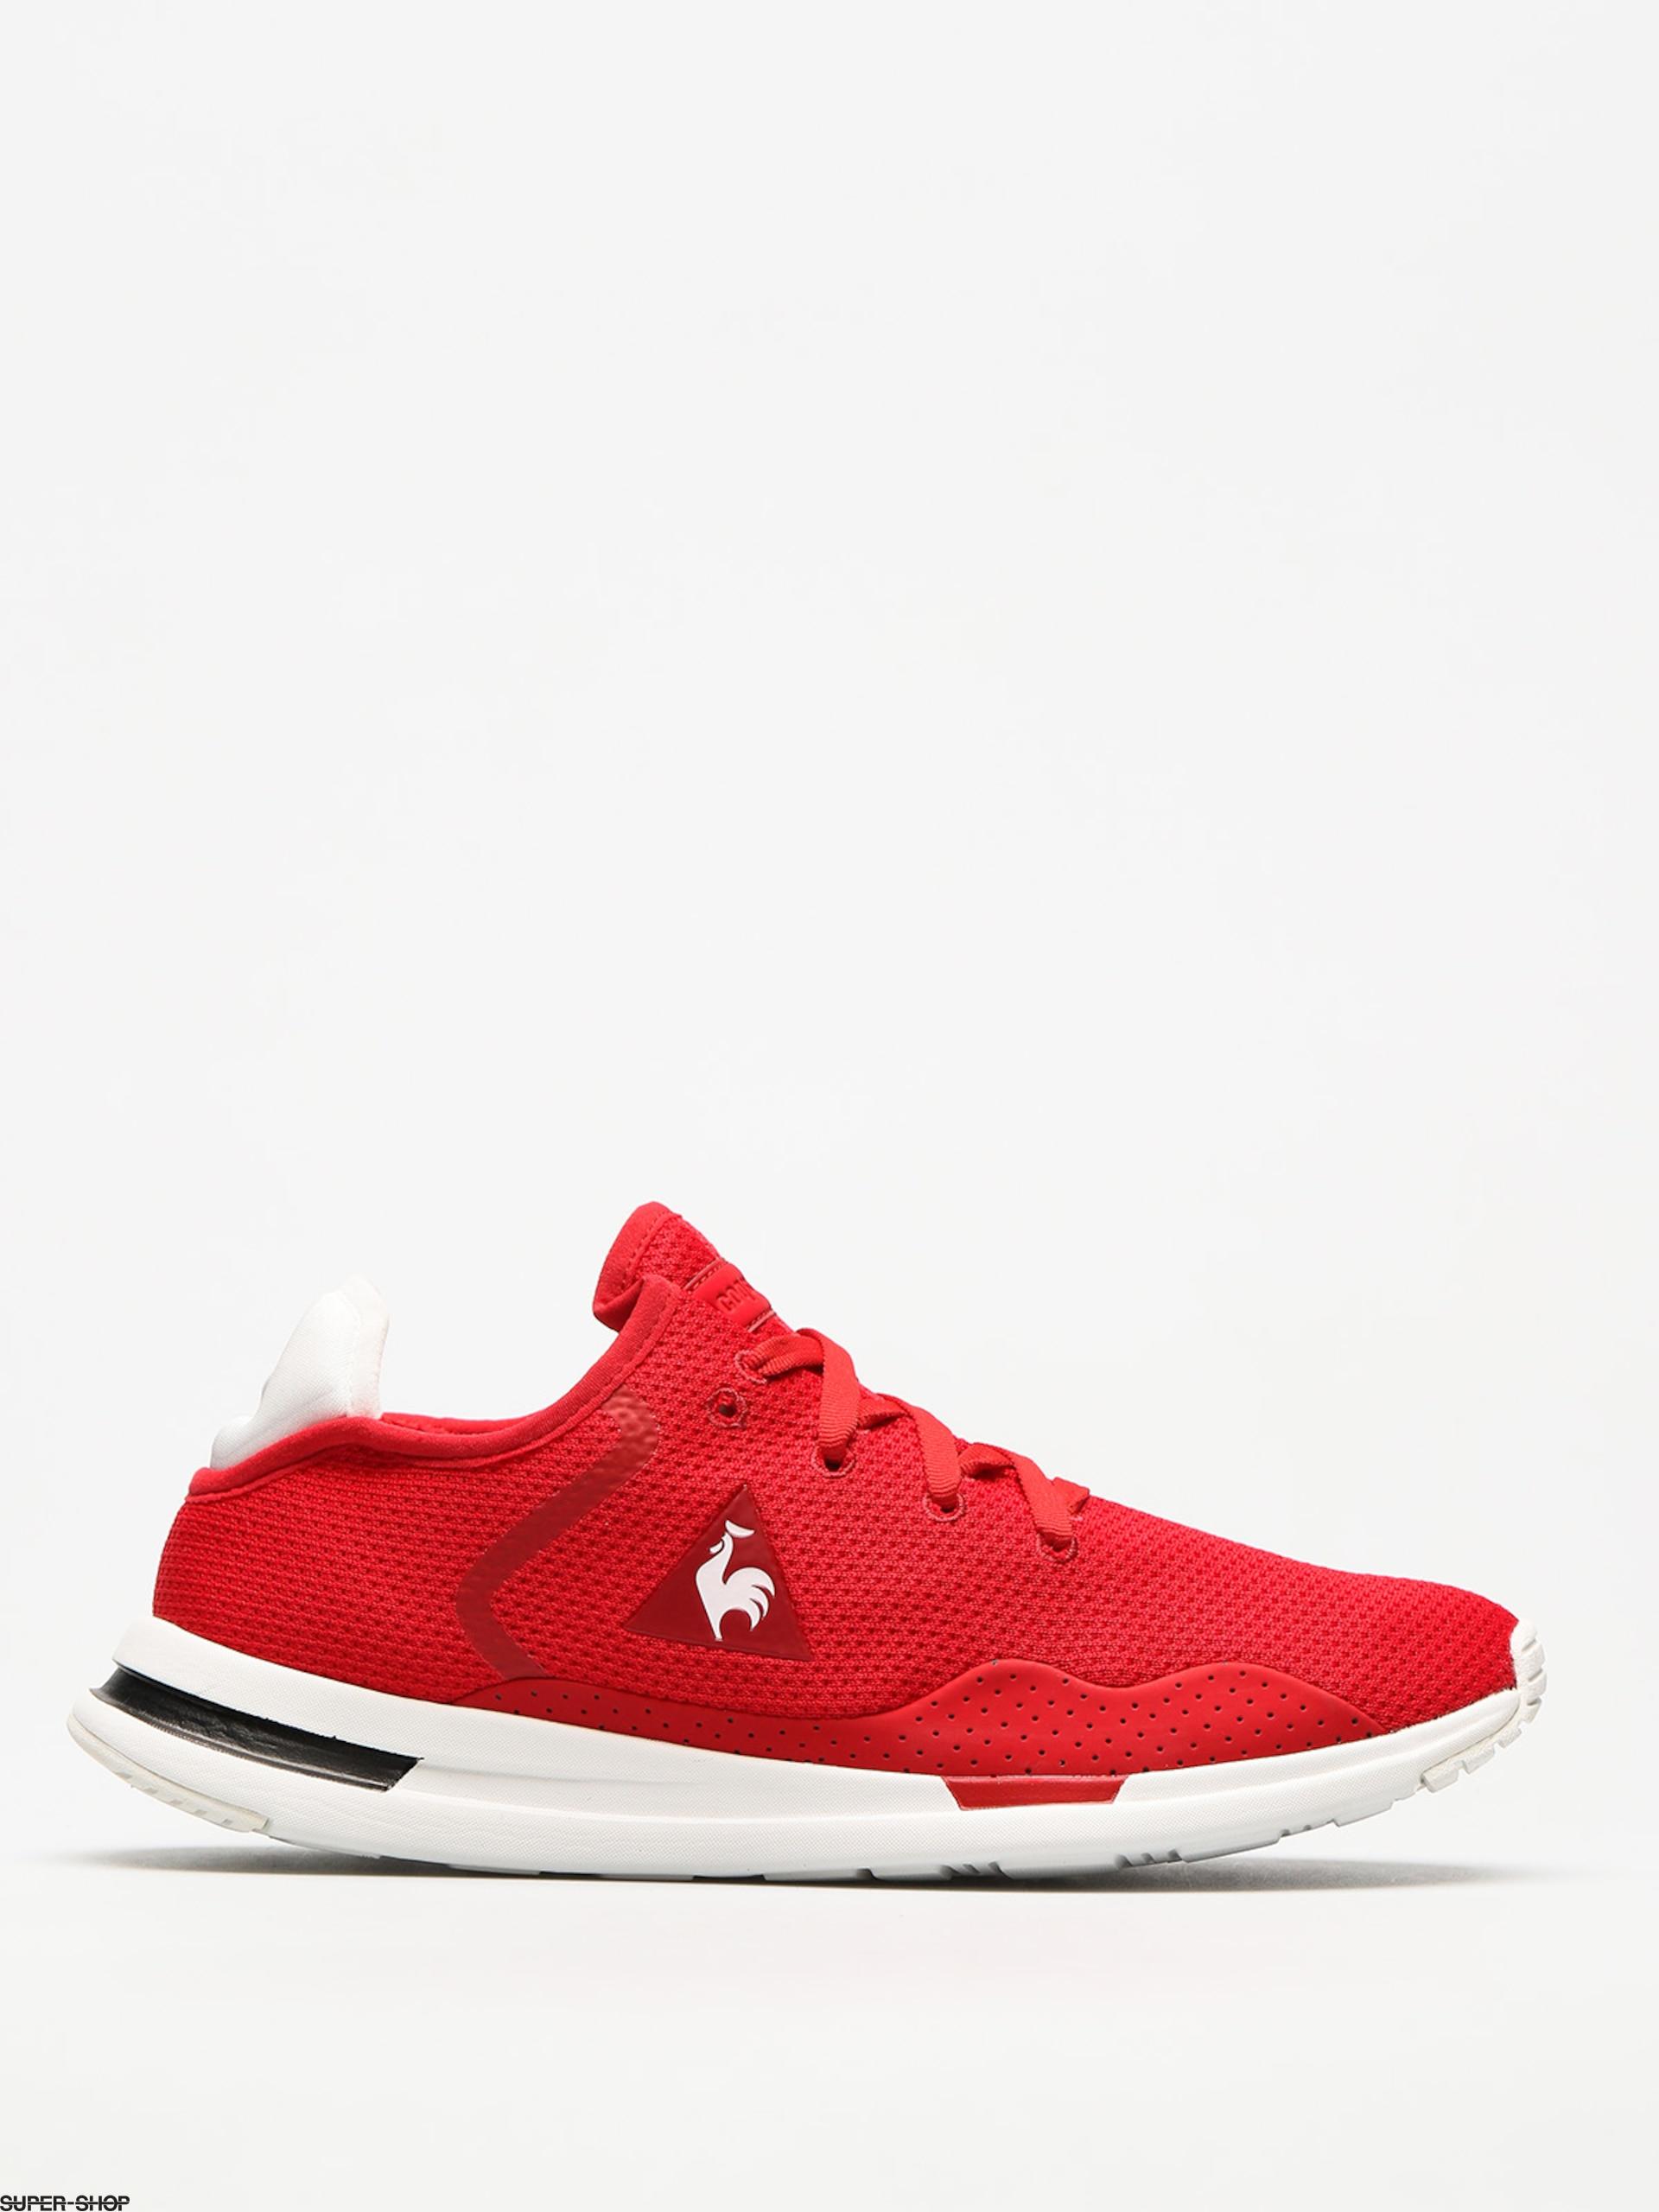 meet 3b5a3 7678e Le Coq Sportif Schuhe Solas Sport (vintage red)